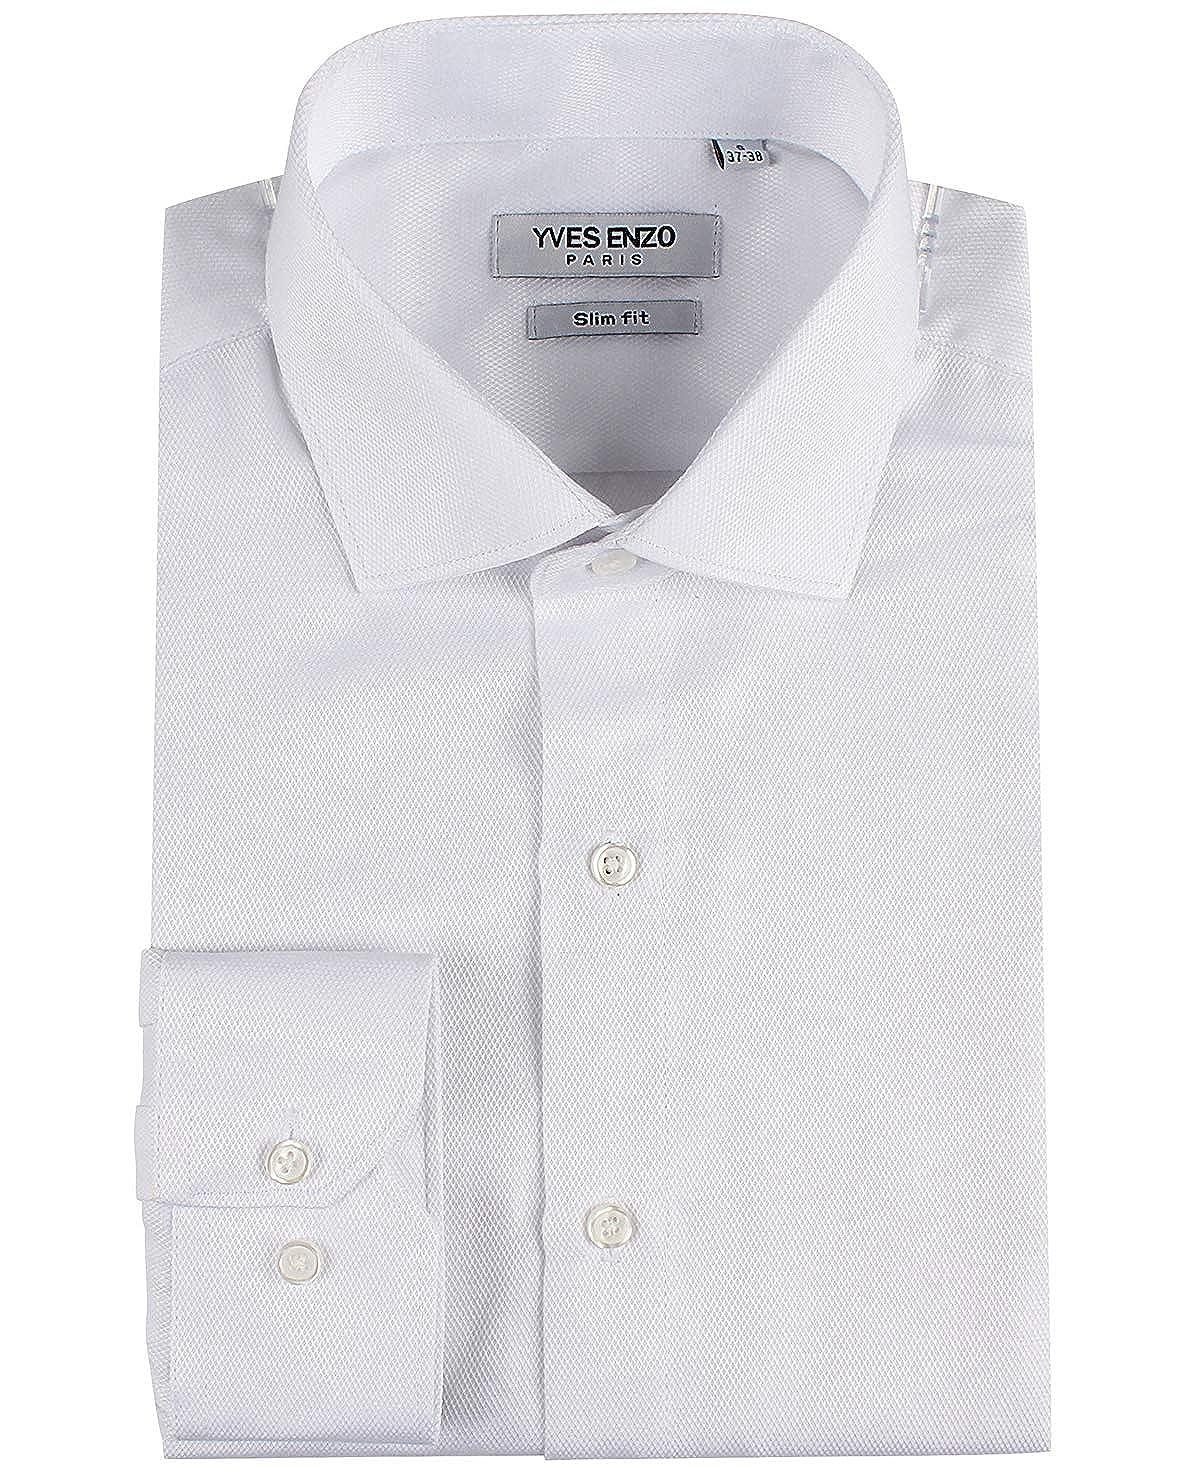 Sin Para De 34 Blusa Casual Top Cuello Manga Camisa Hombre Lino vf6gY7yb